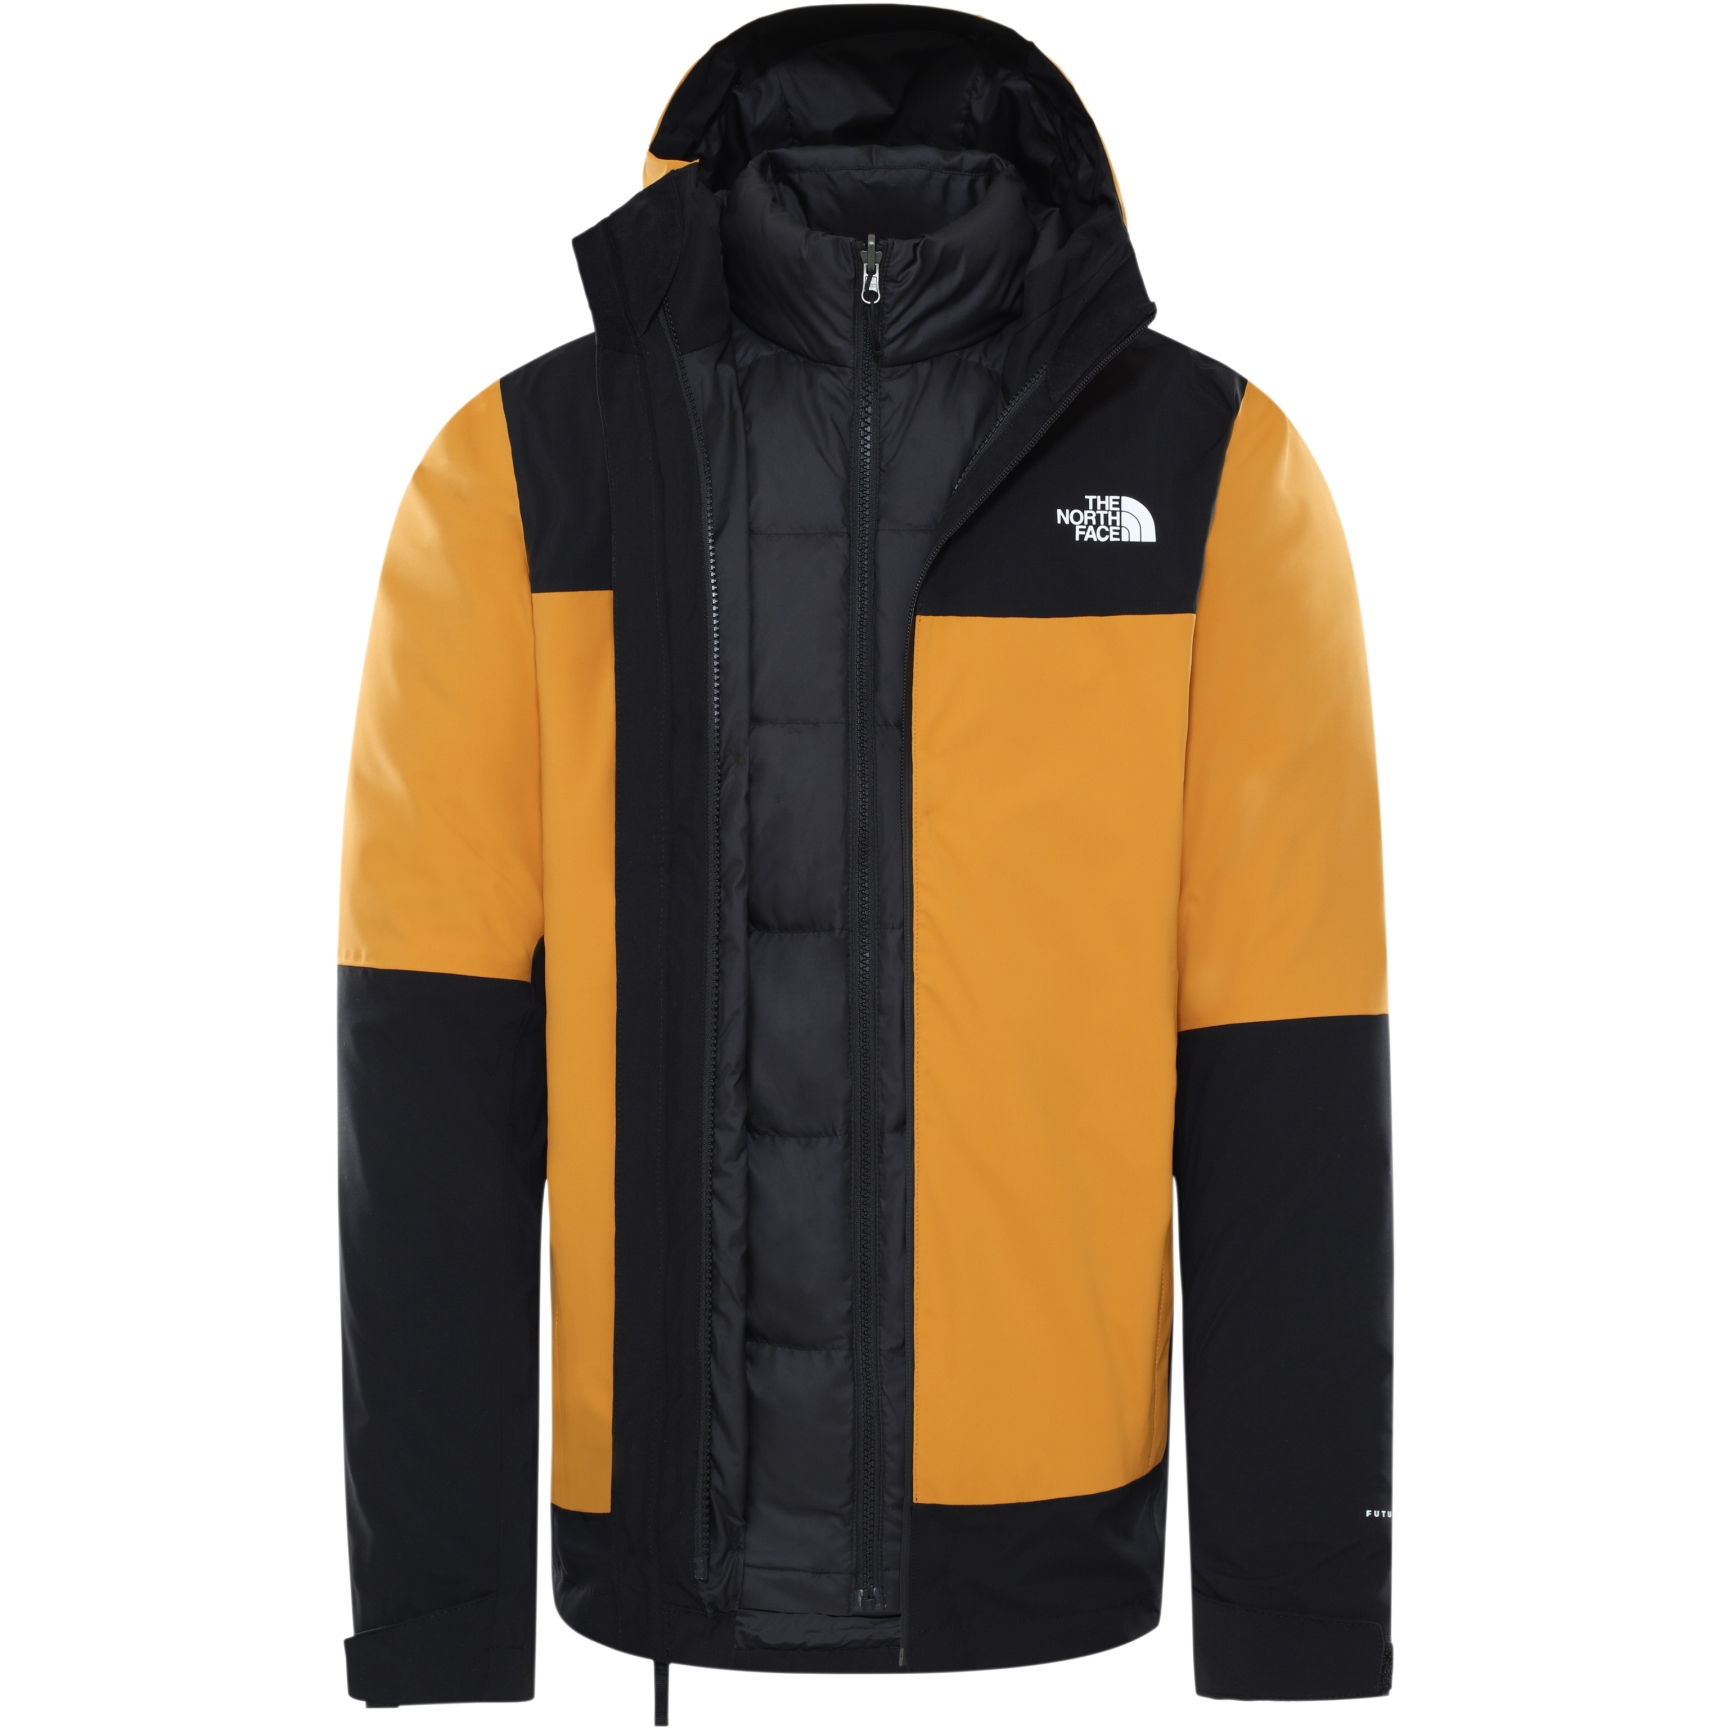 Produktbild von The North Face Herren Mountain Light FutureLight Triclimate Jacke - Citrine Yellow/TNF Black/TNF Black